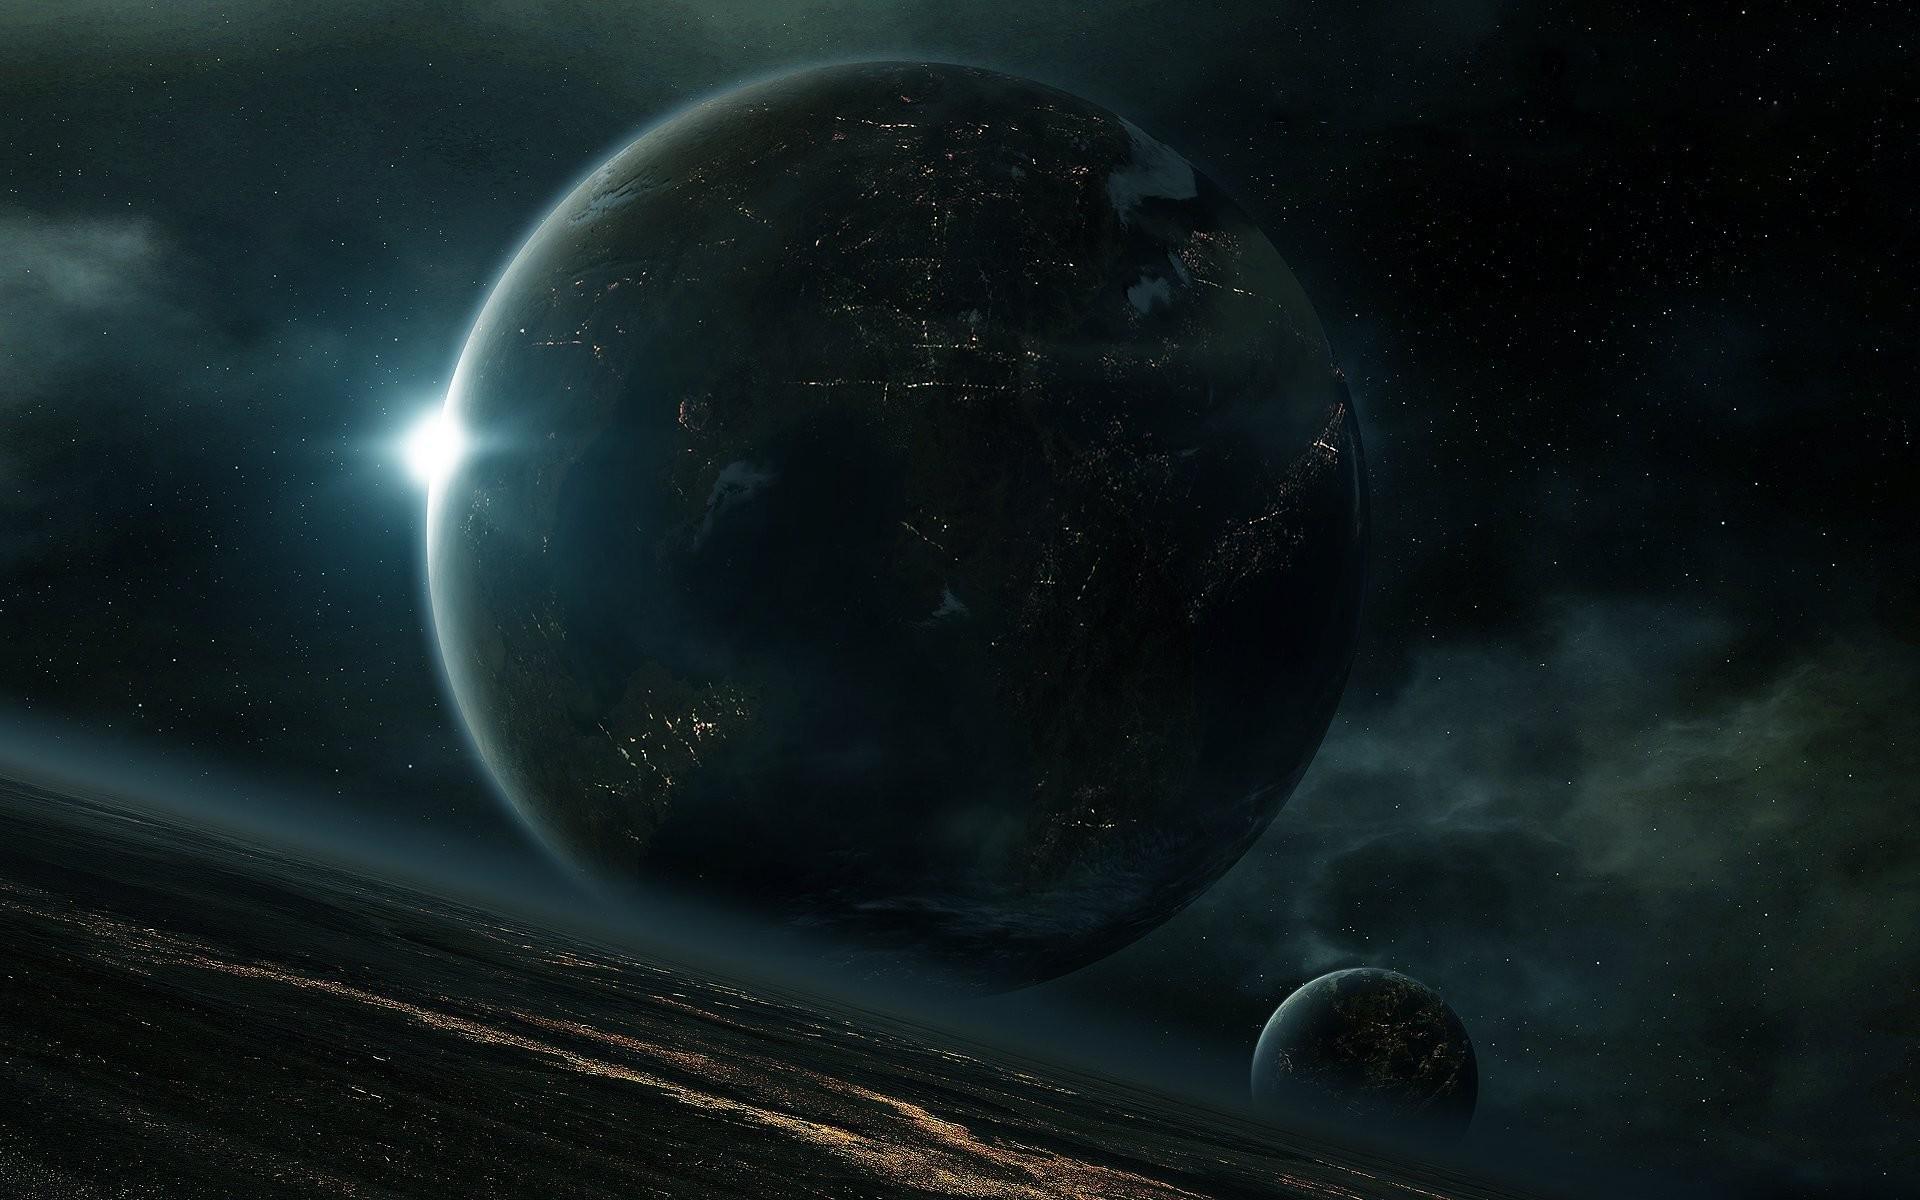 habitable planet lights mega-cities space star